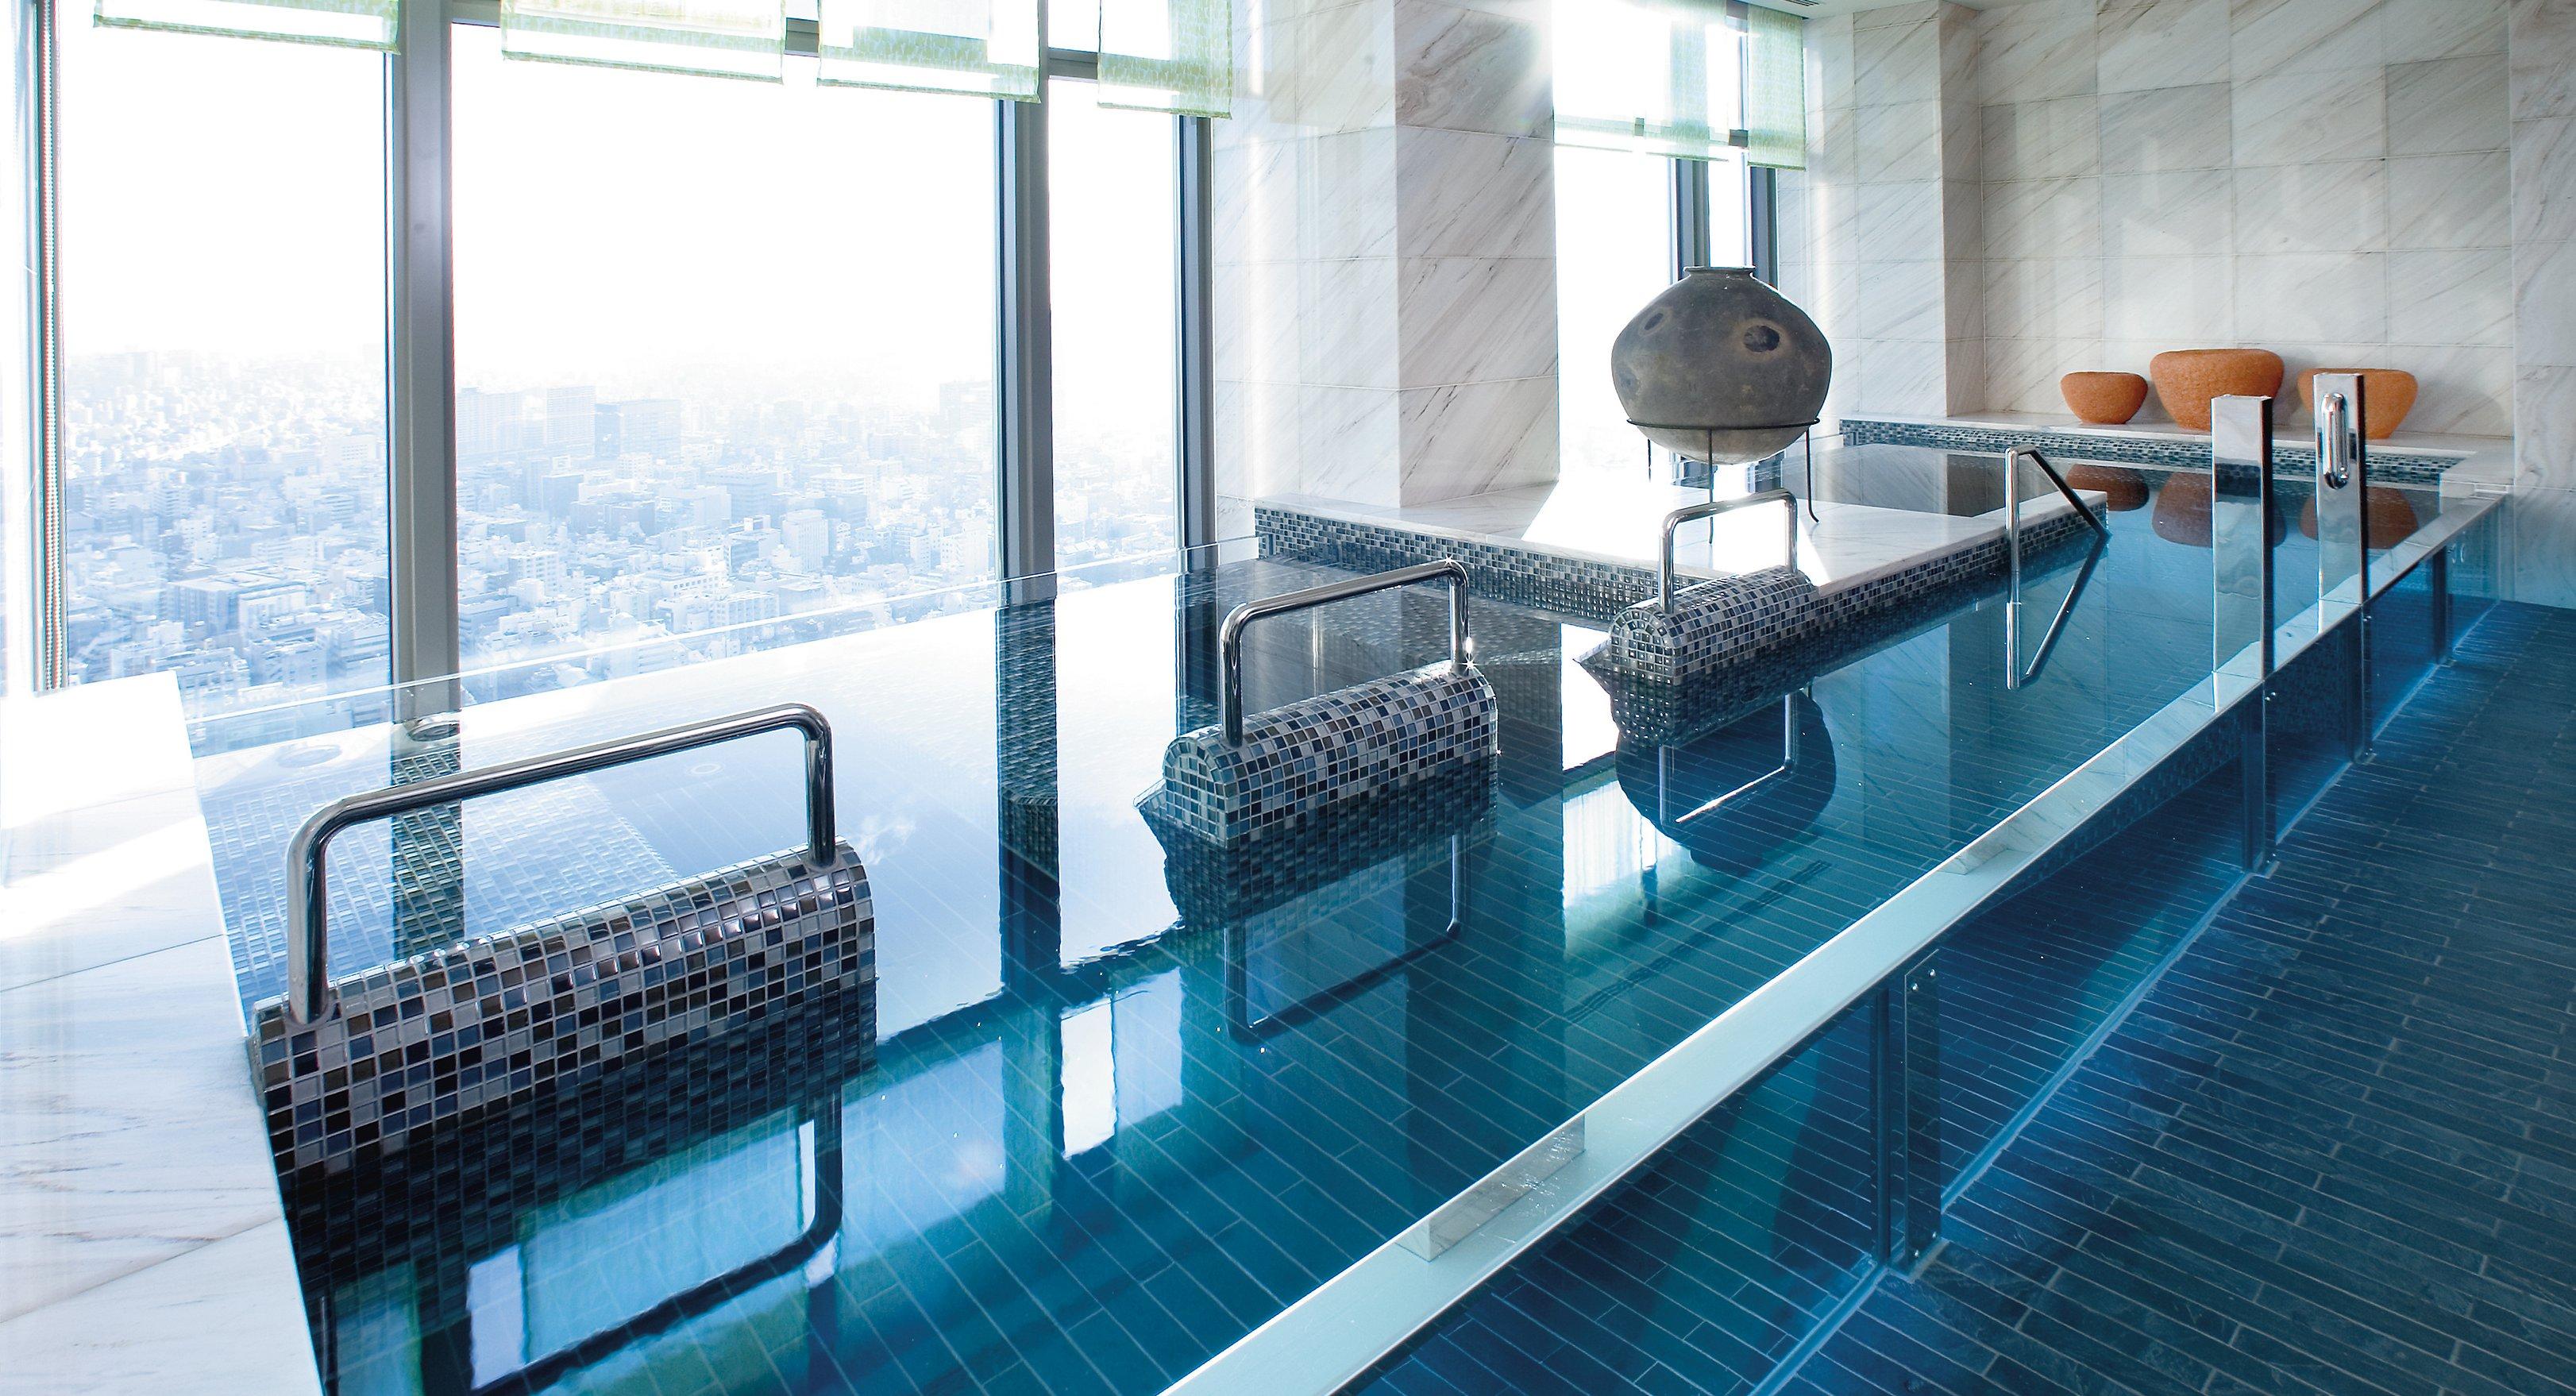 mandarin-oriental-tokyo-spa-pool